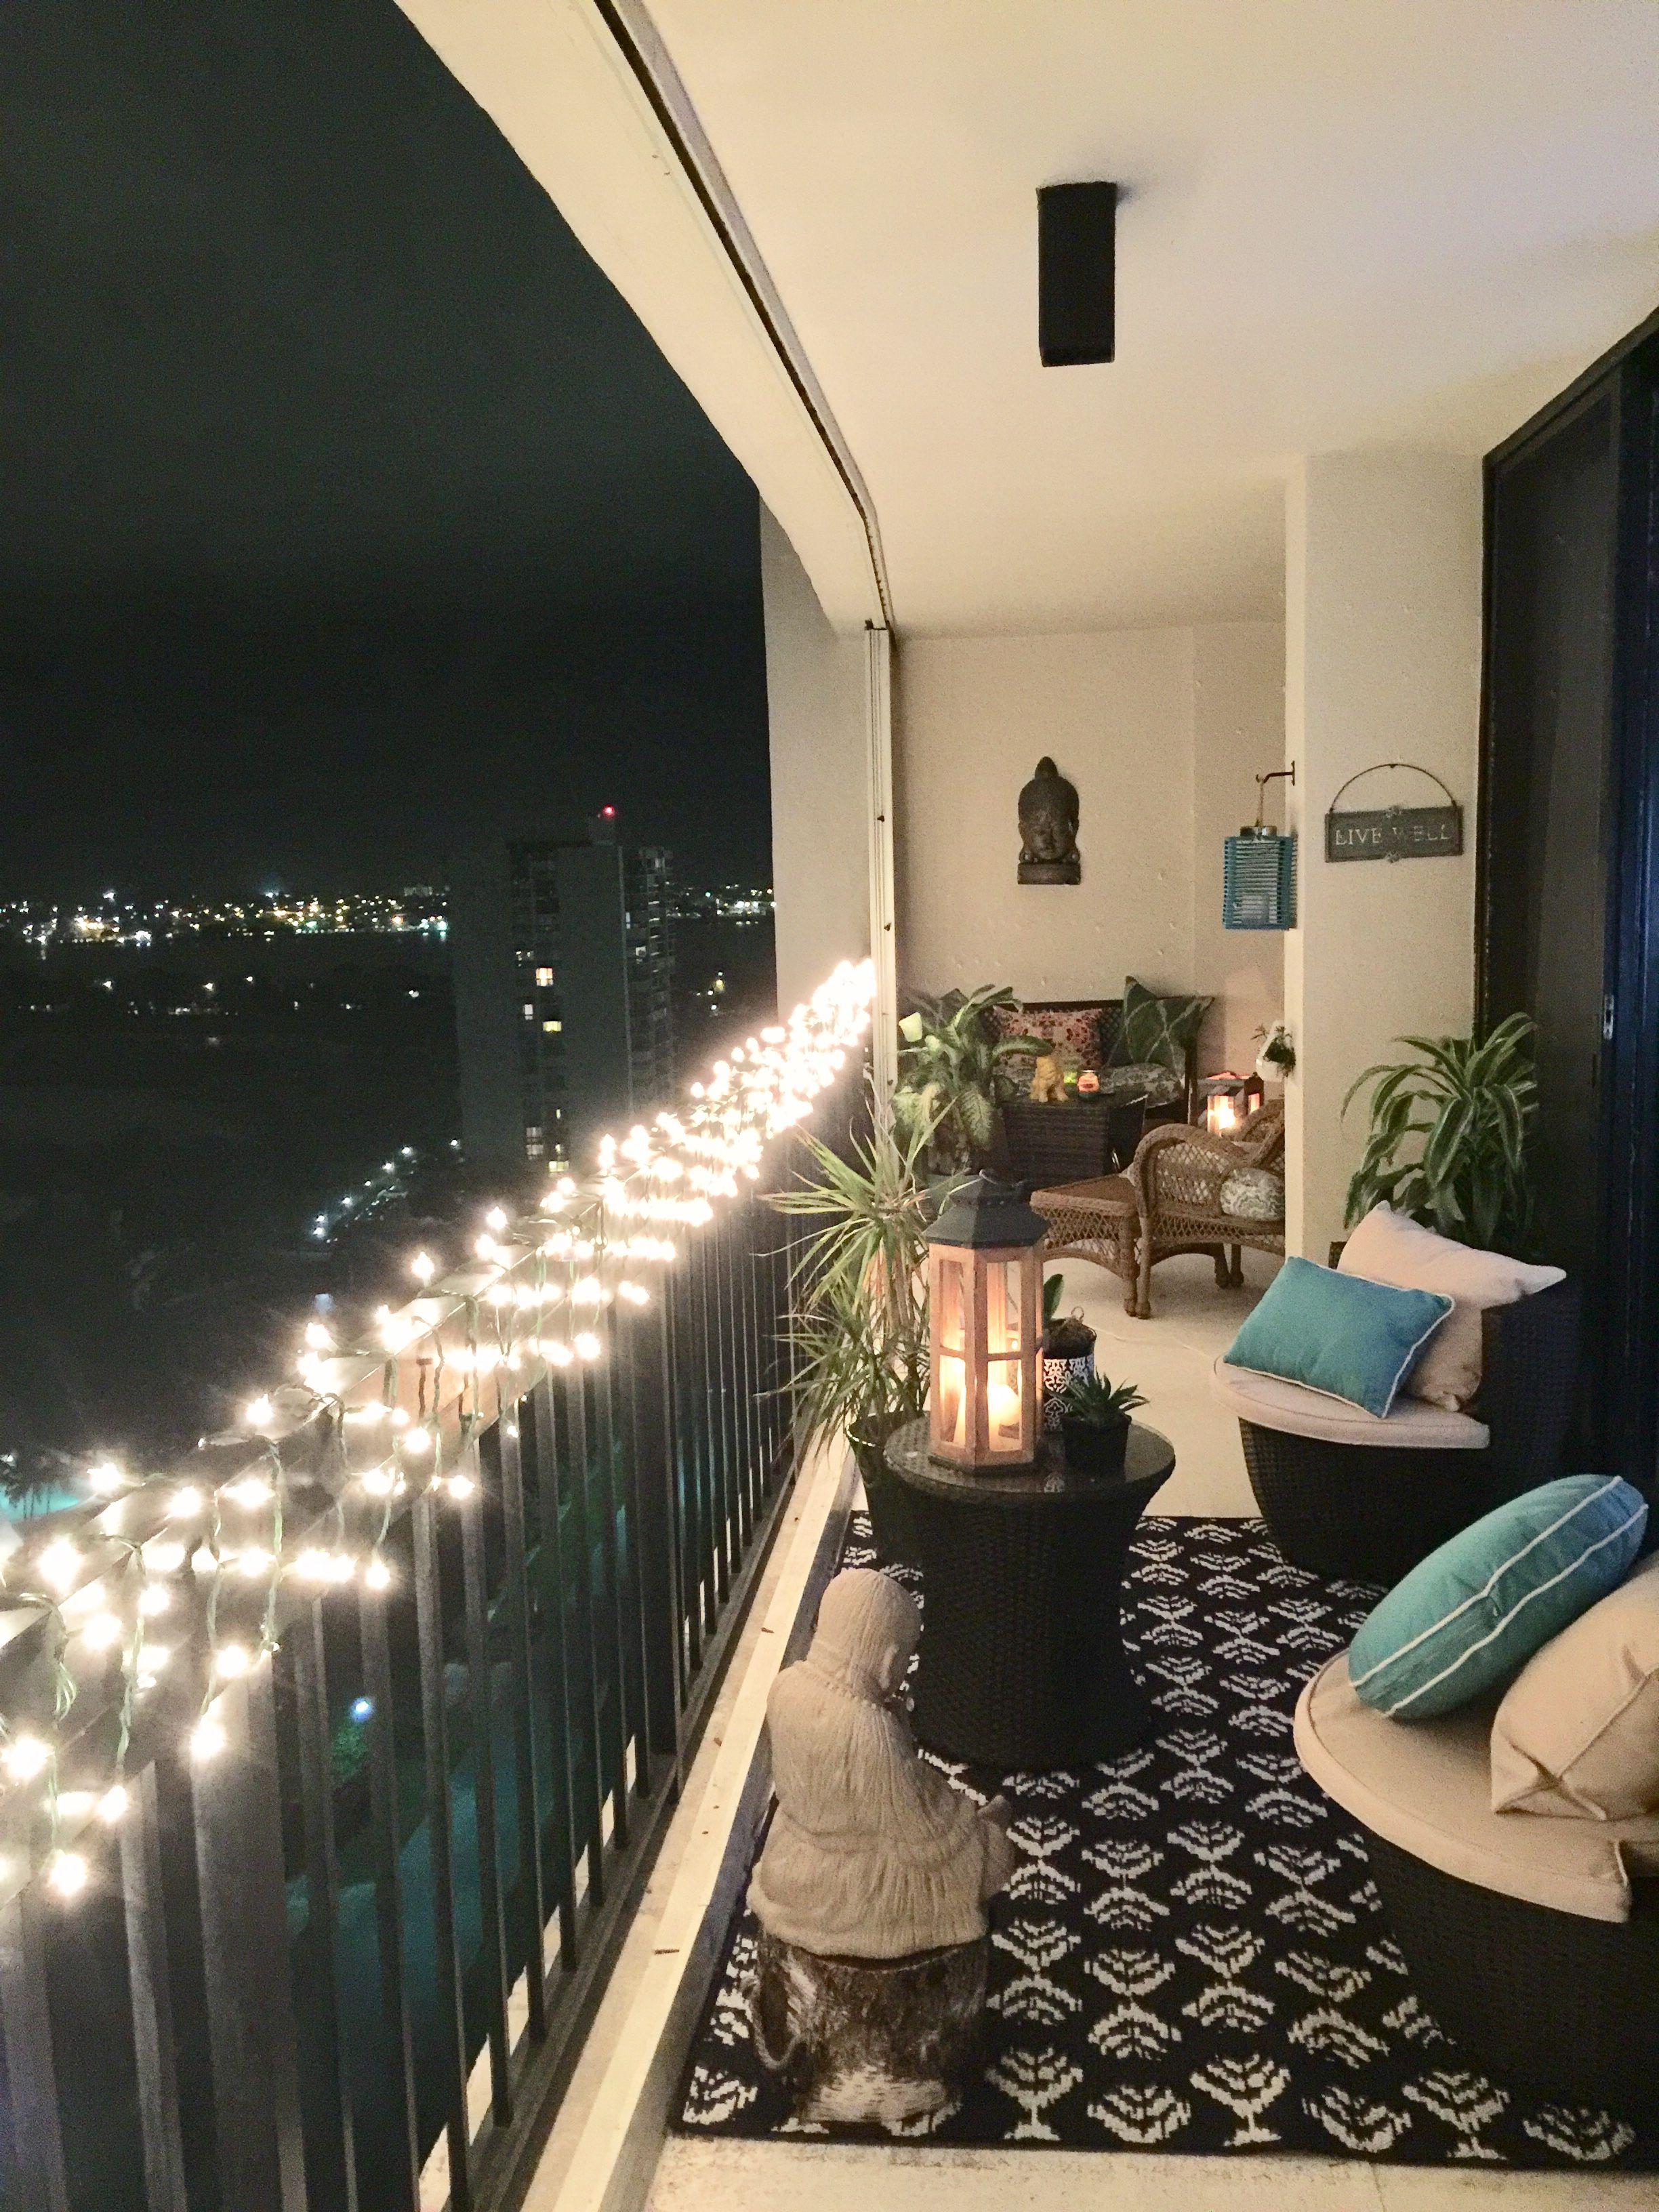 West Palm Beach Condo Balcony Beach Apartment Decor Florida